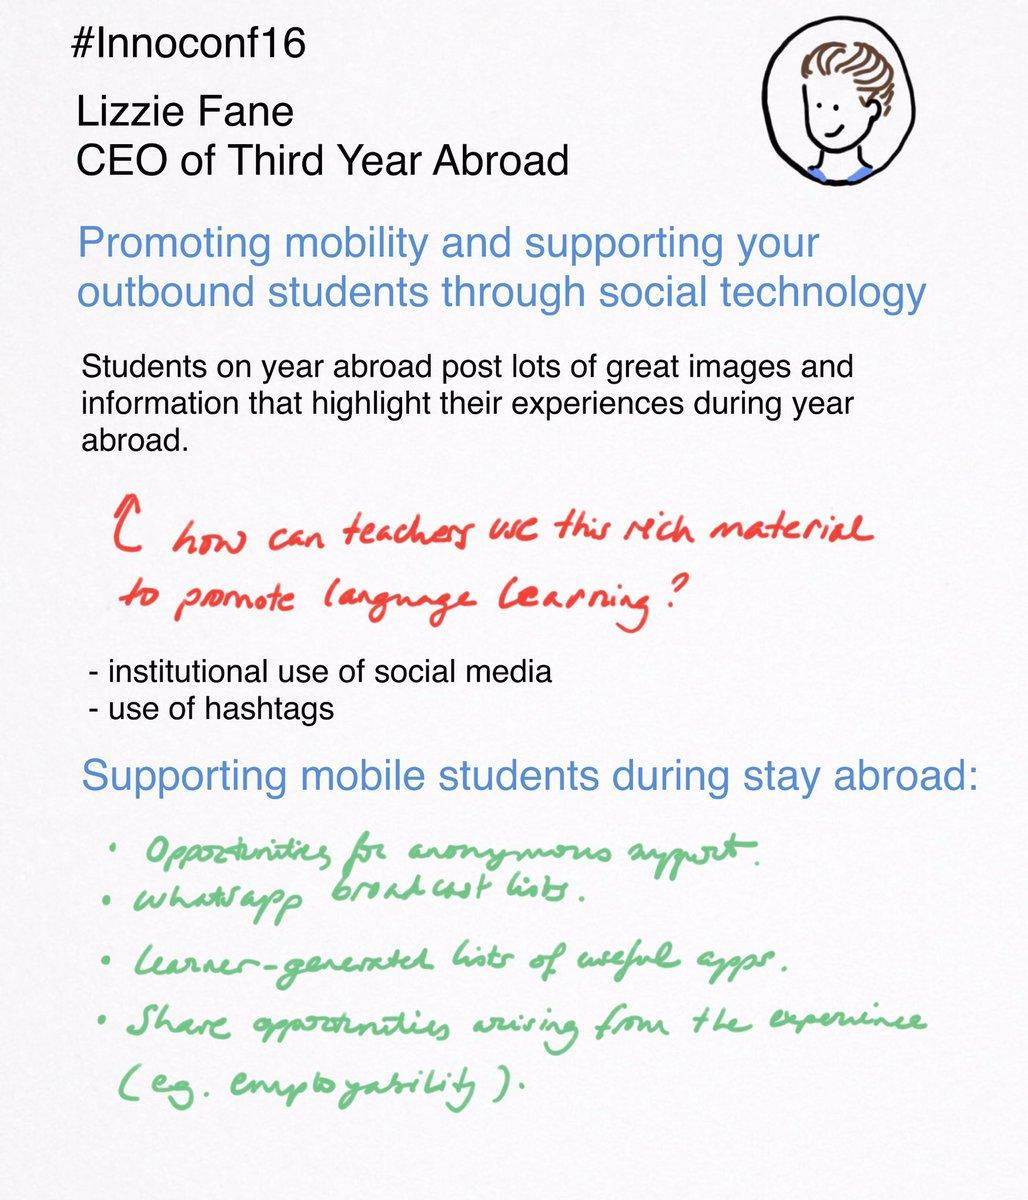 #Sketchnote of Lizzie Fane's talk at #innoconf16 https://t.co/BZkW6xz5Dt